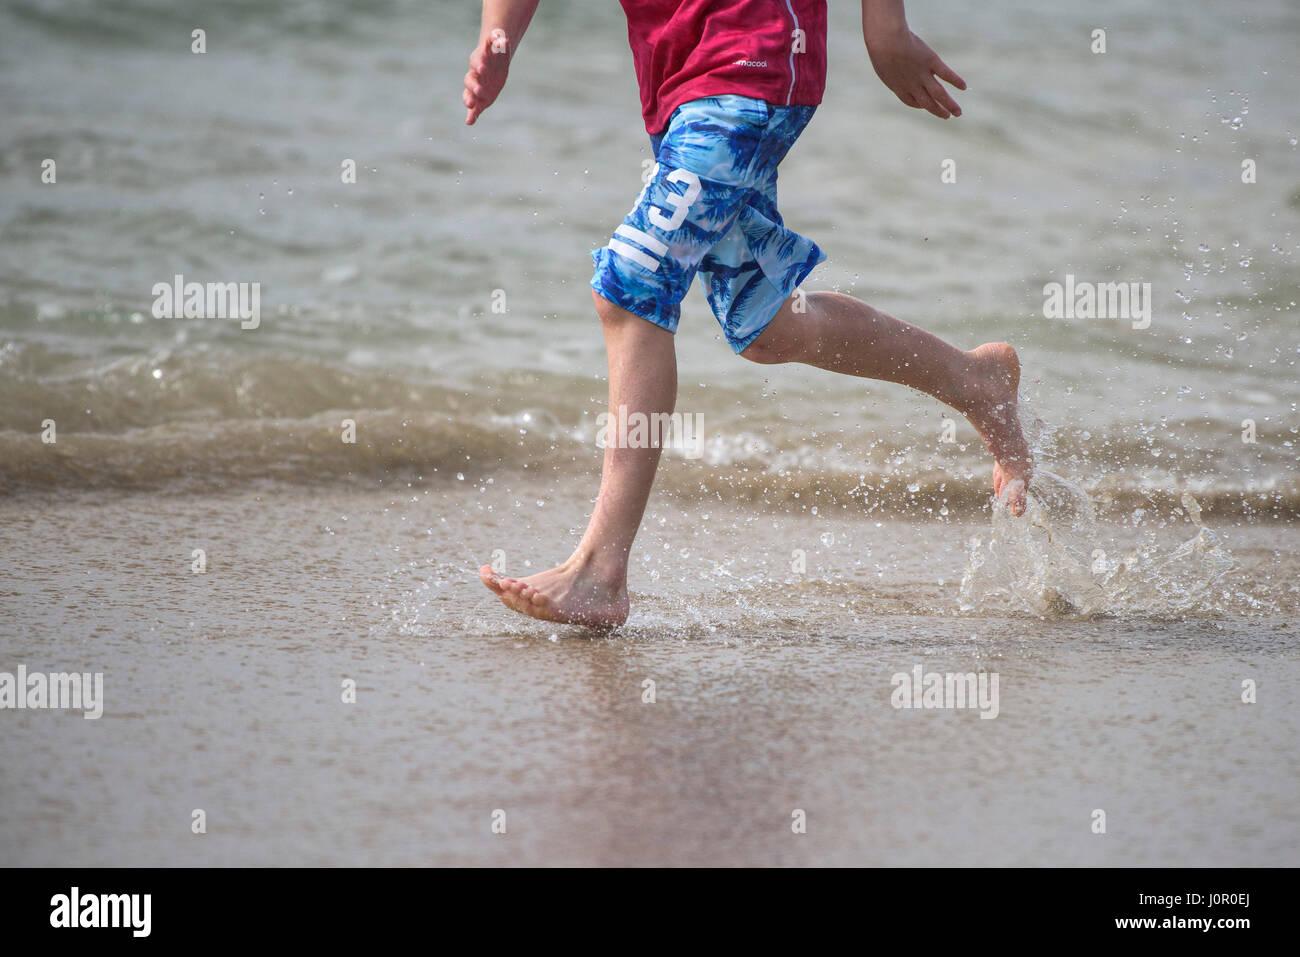 Fistral Newquay Person running along shoreline Splash Splashing Runner Spray Water Barefoot Energy Energetic Seaside - Stock Image